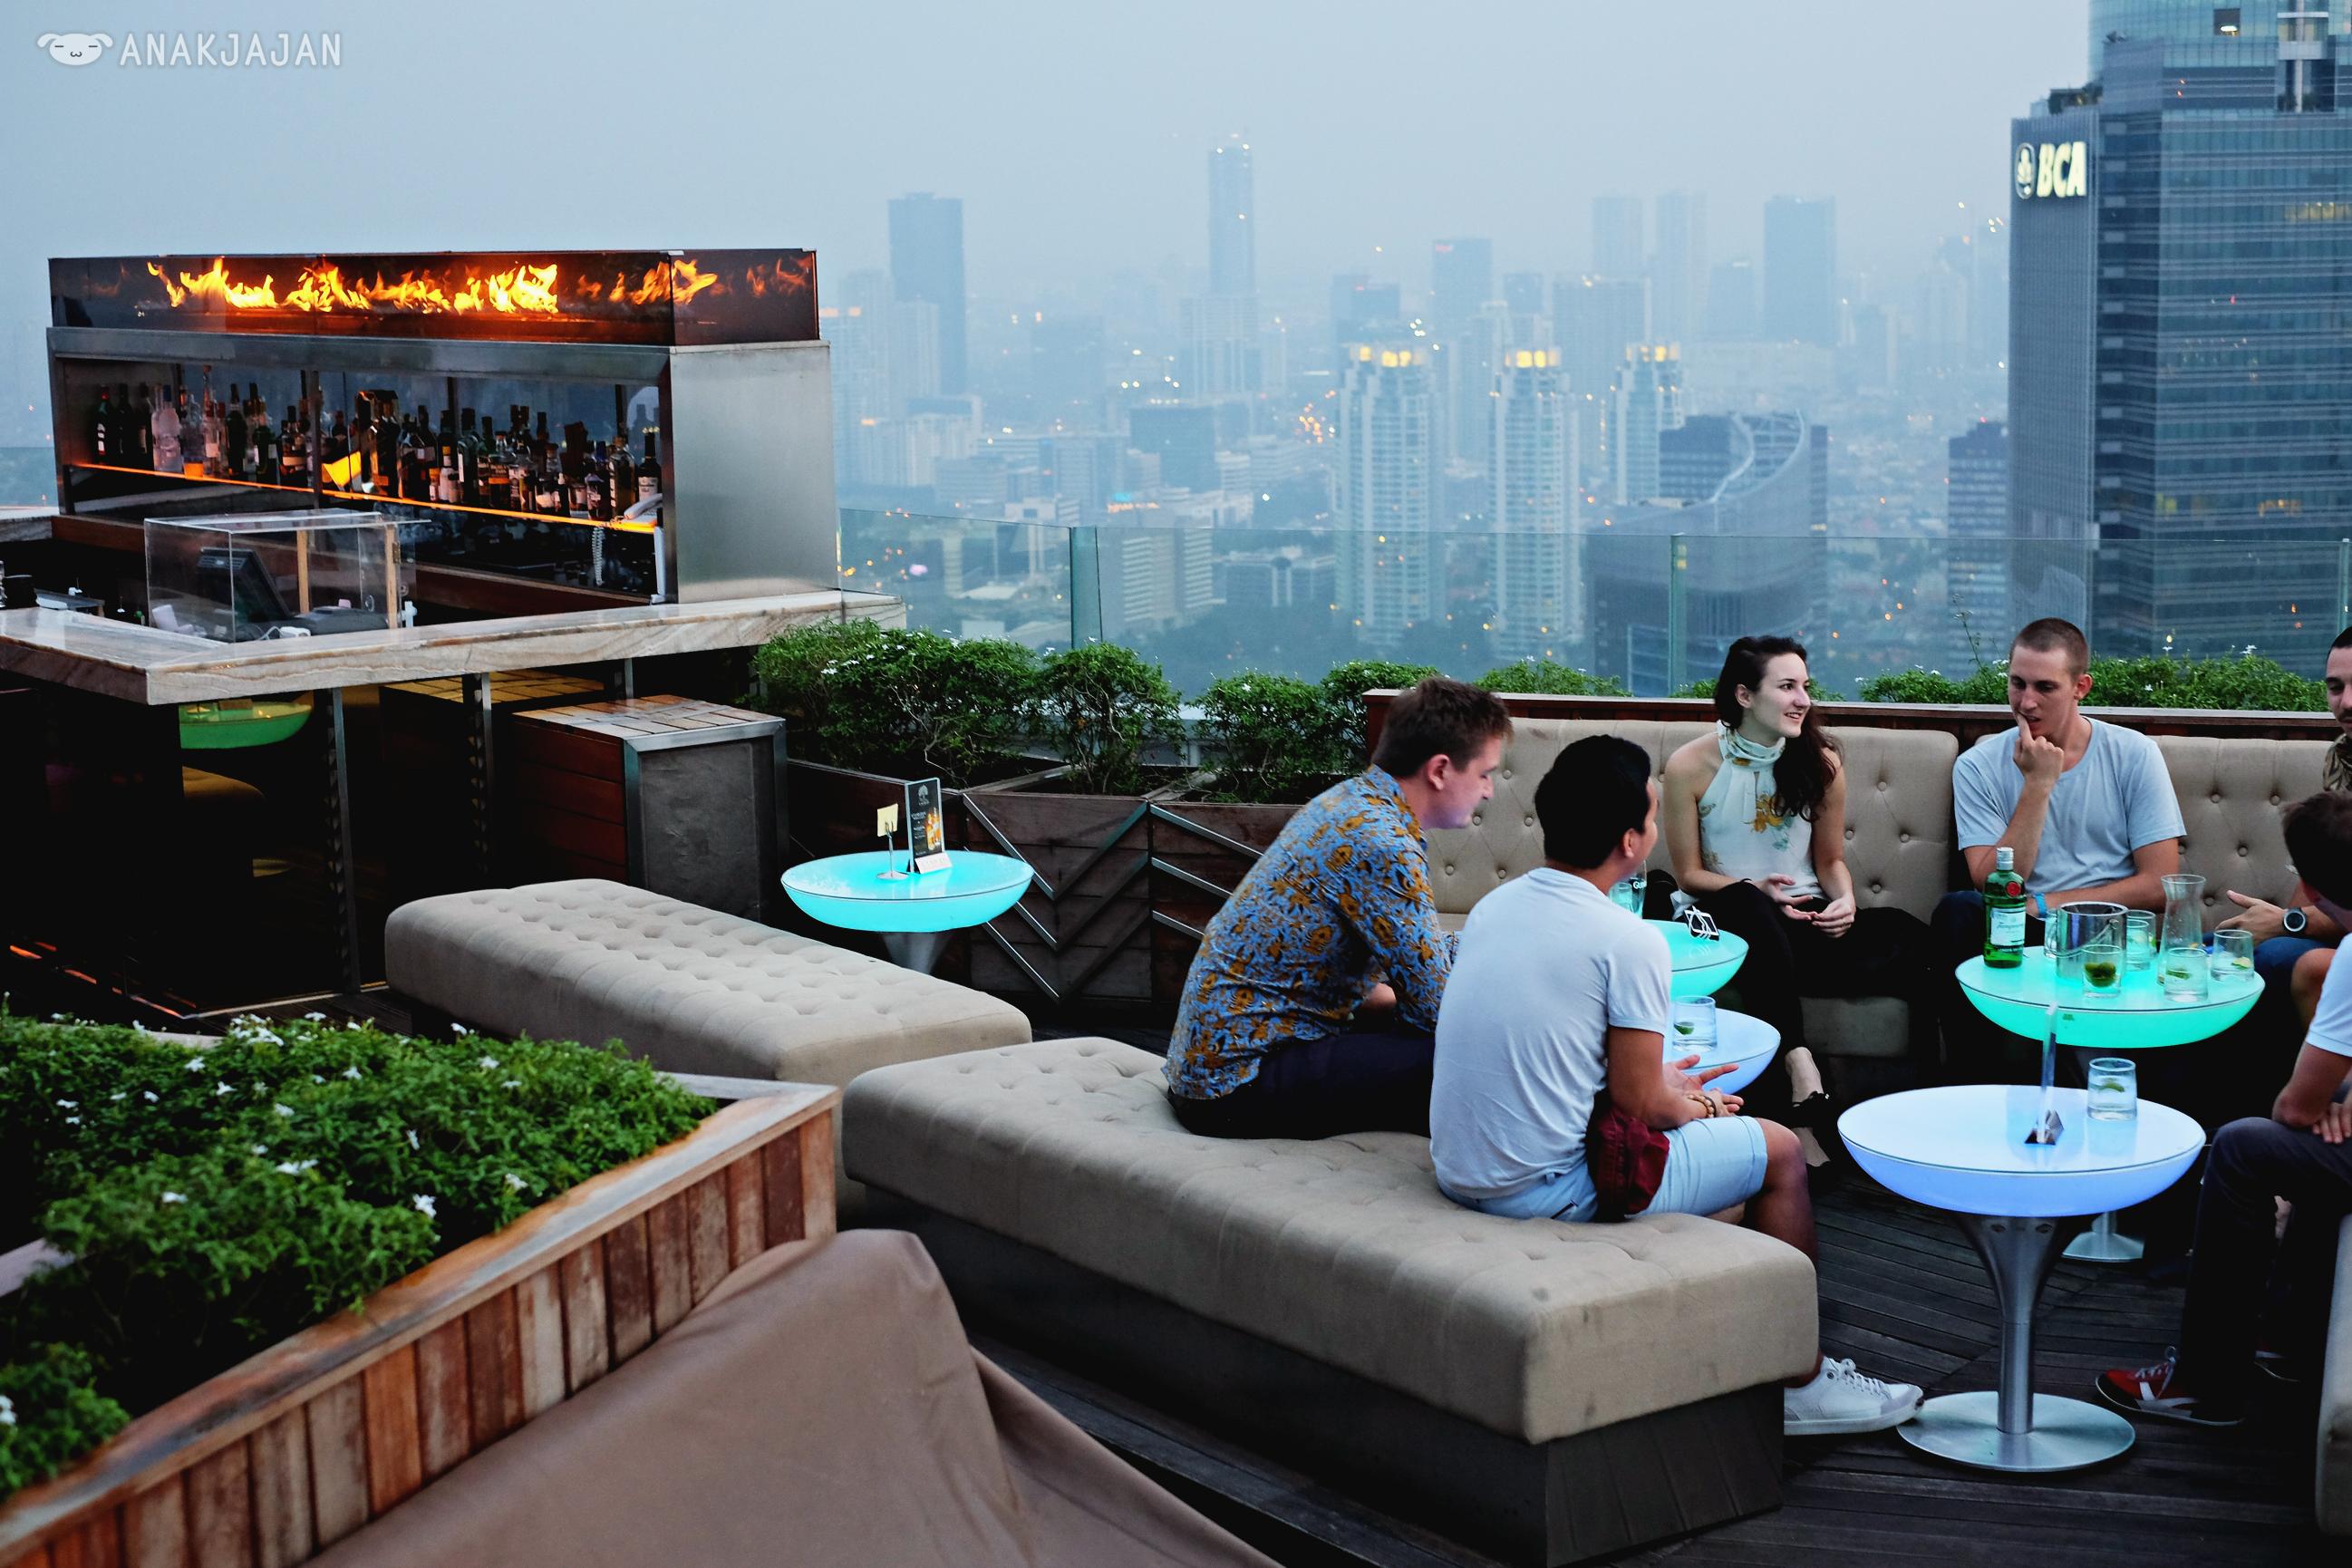 cloud lounge and living room CLOUD Lounge Living Room by Metaphor Jakarta Indonesia 06 CLOUD  540 X 720